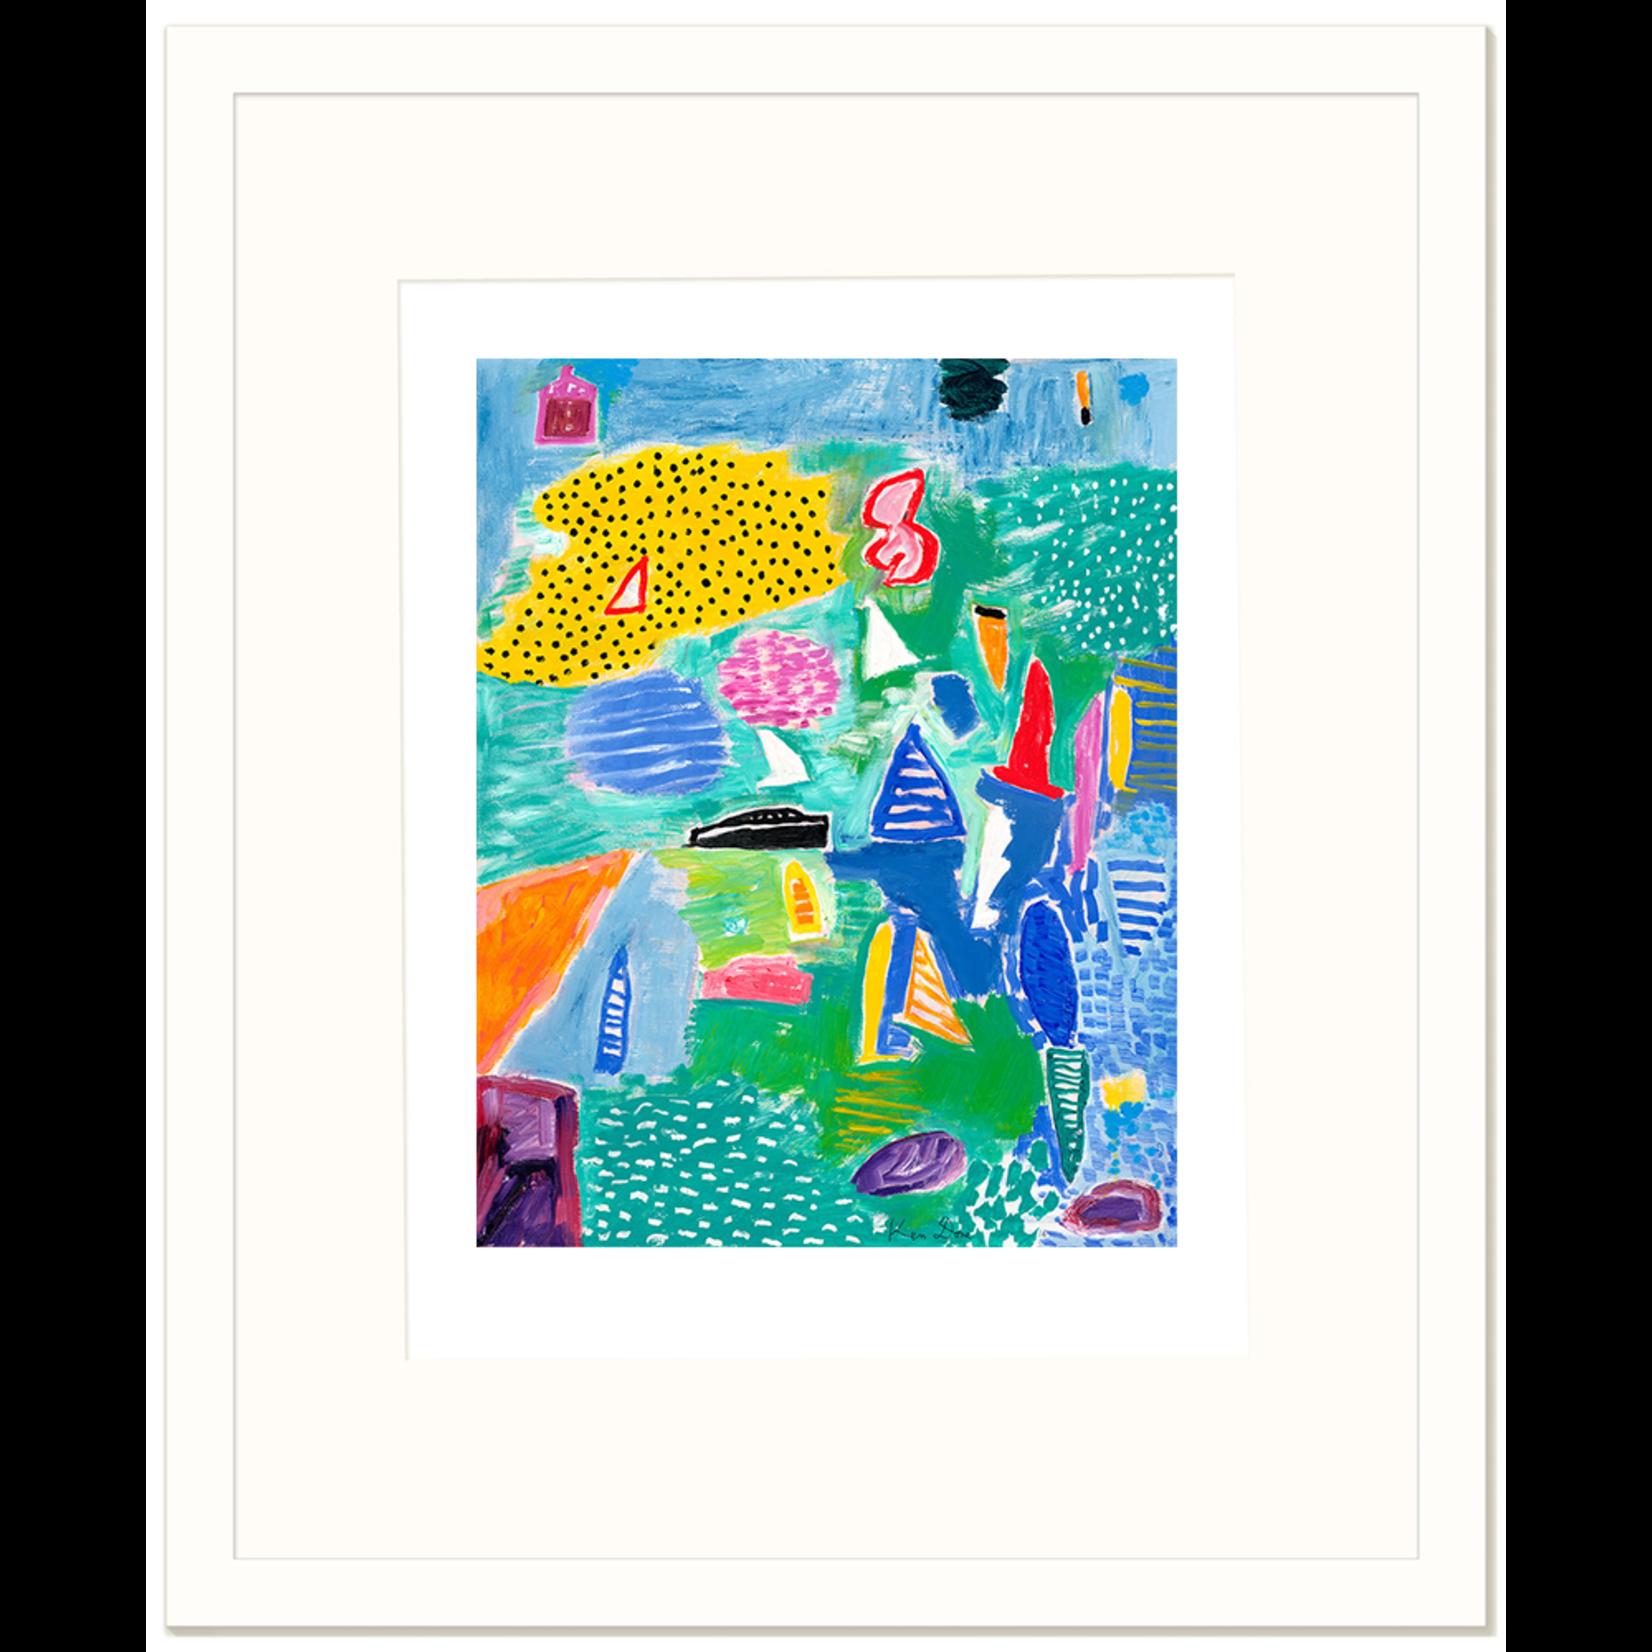 Limited Edition Prints Saturday sailing, 2016